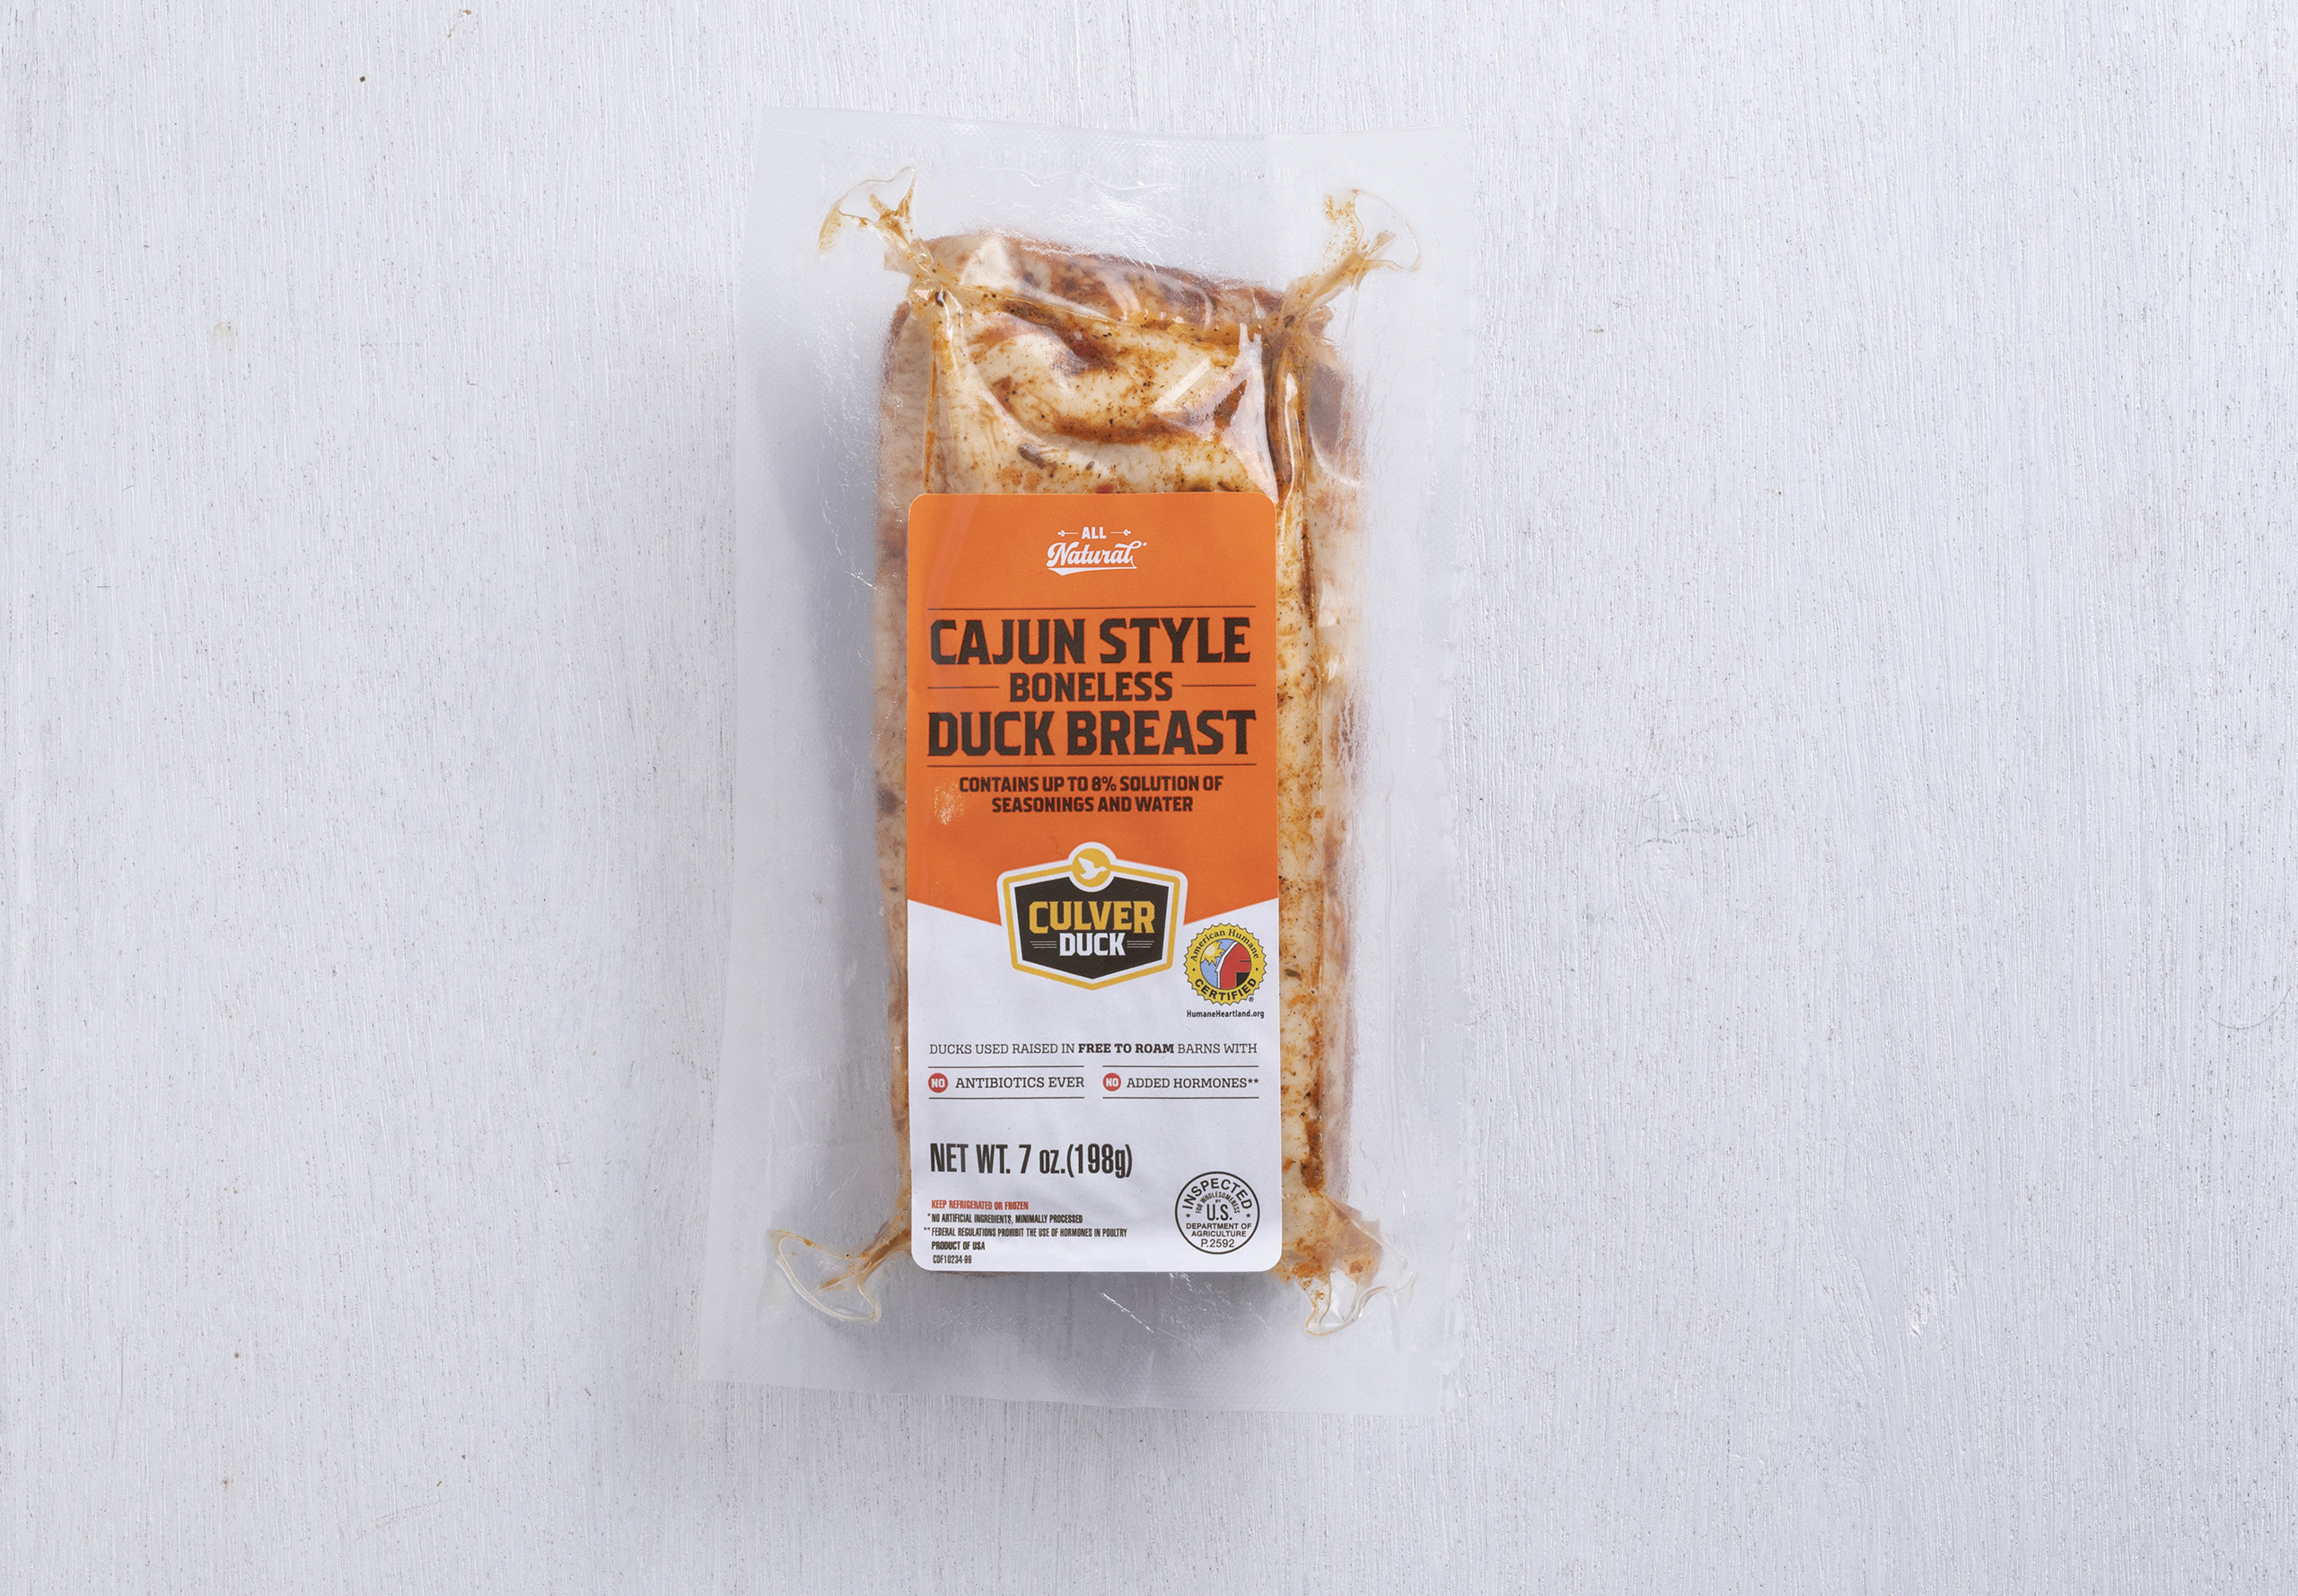 Cajun Style Boneless Duck Breast